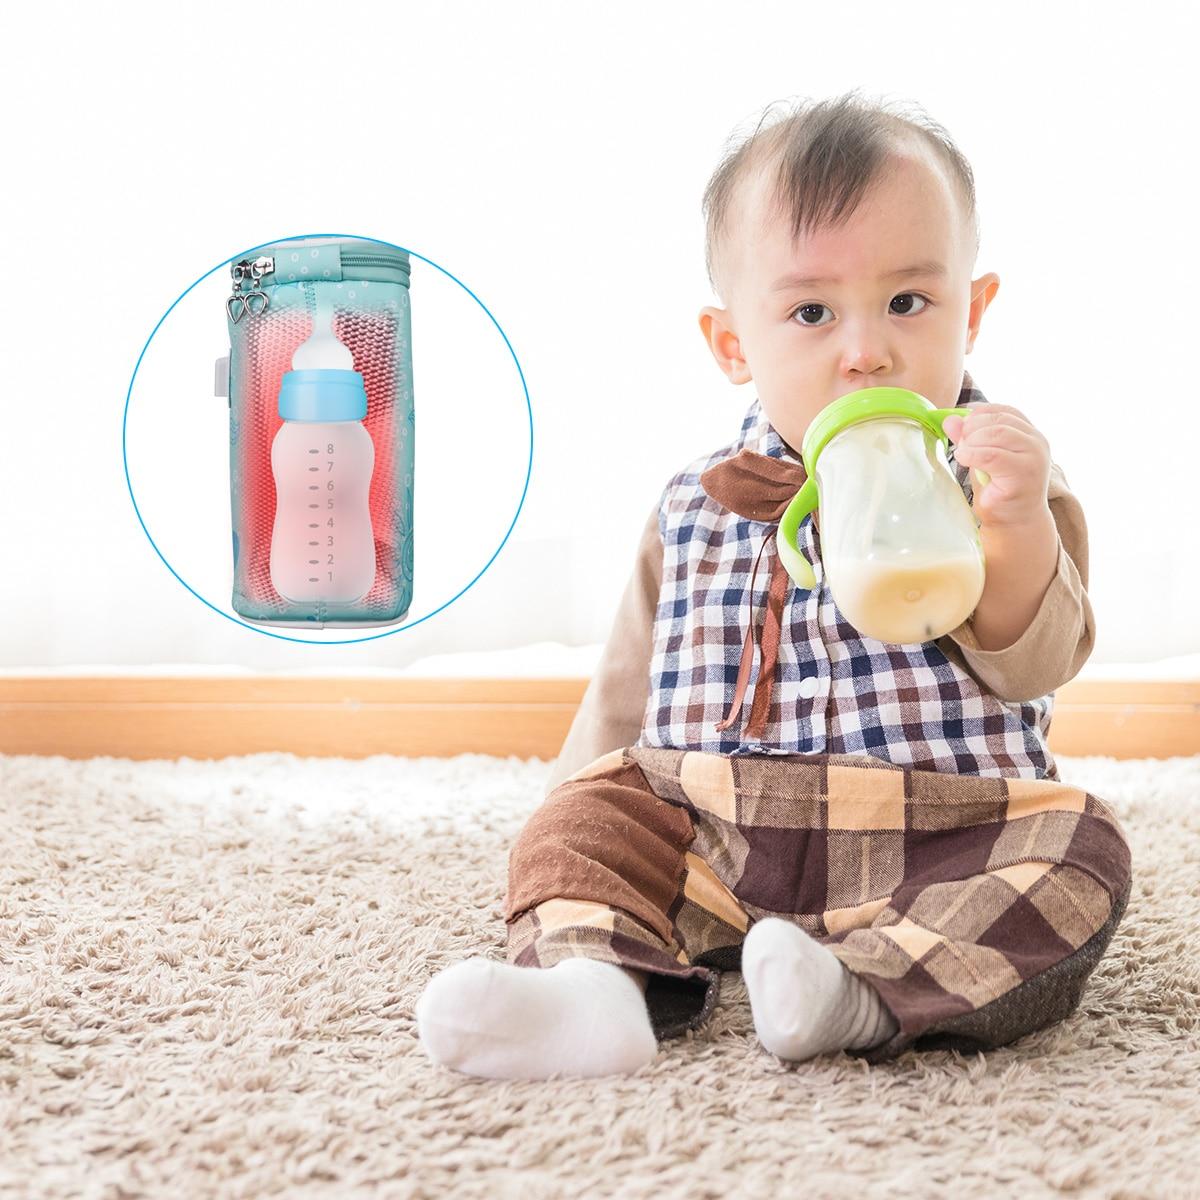 USB Charging Newborn Baby Bottle Warmer Portable Outdoor Infant Milk Feeding Bottle Heated Cover Baby Nursing Insulated Bag